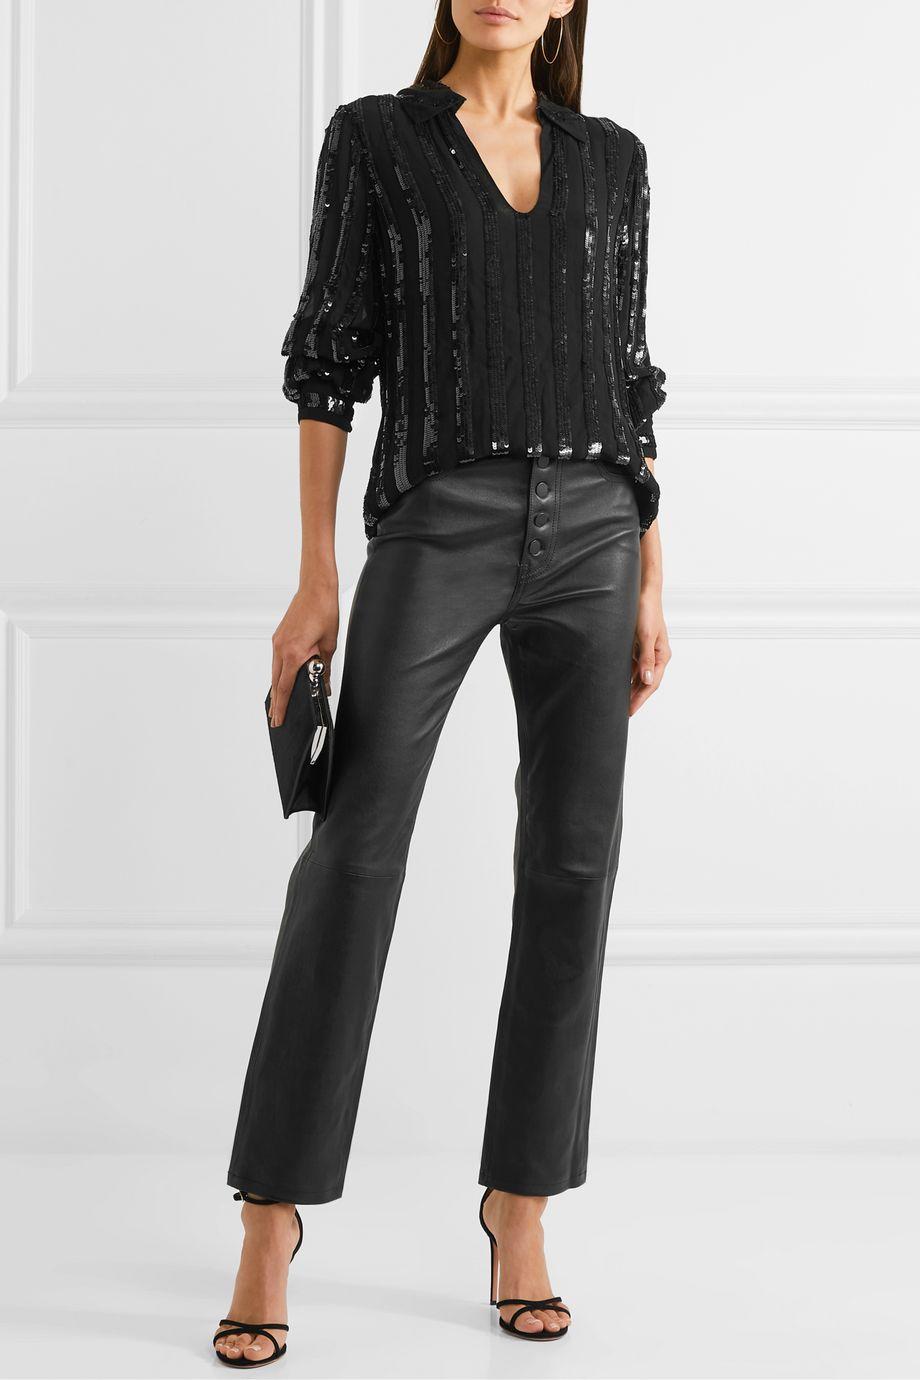 Nili Lotan Anette striped sequined chiffon blouse